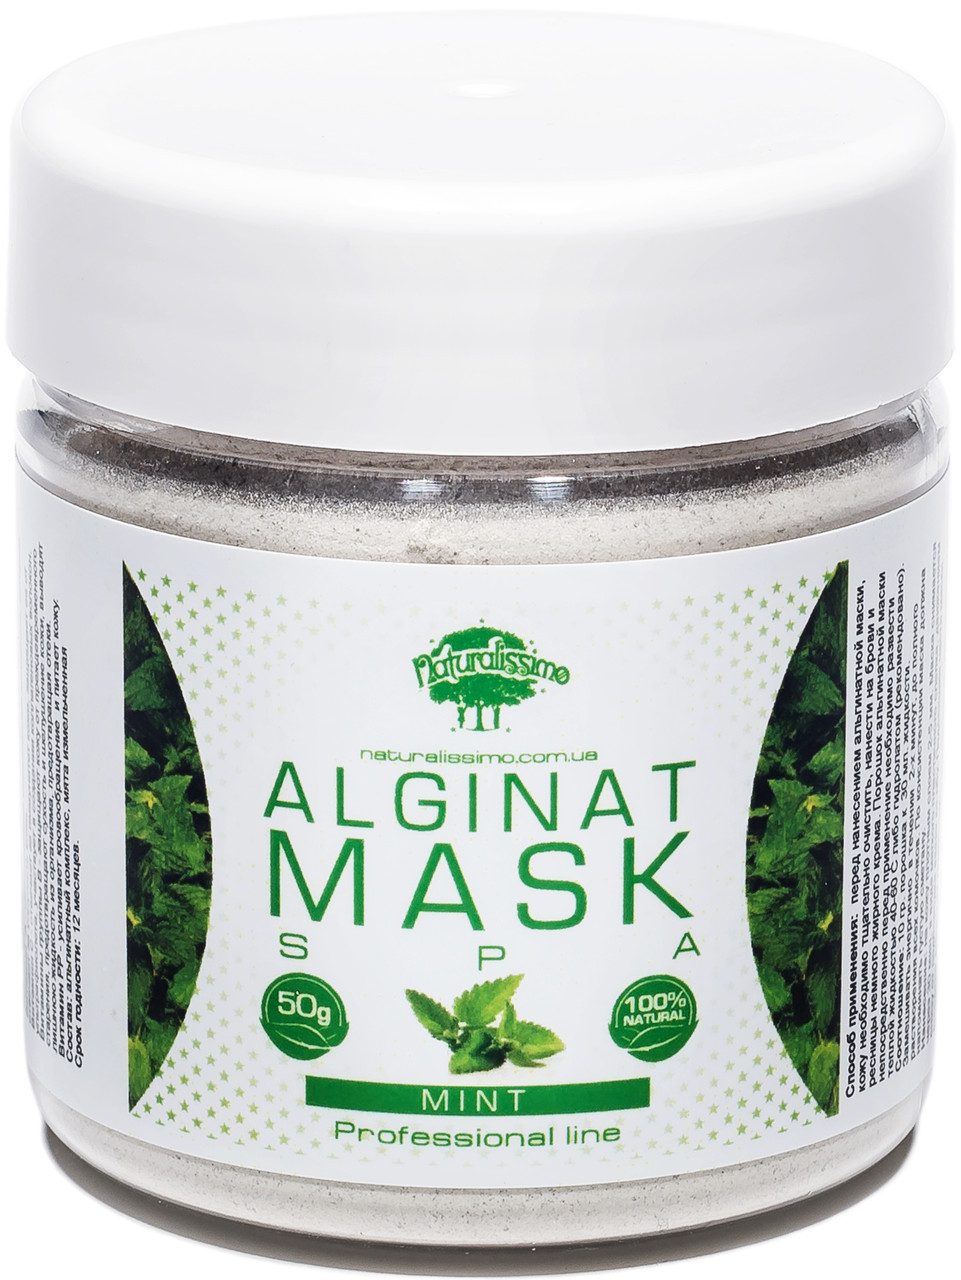 Альгінатна маска Naturalissimo з м'ятою 50г